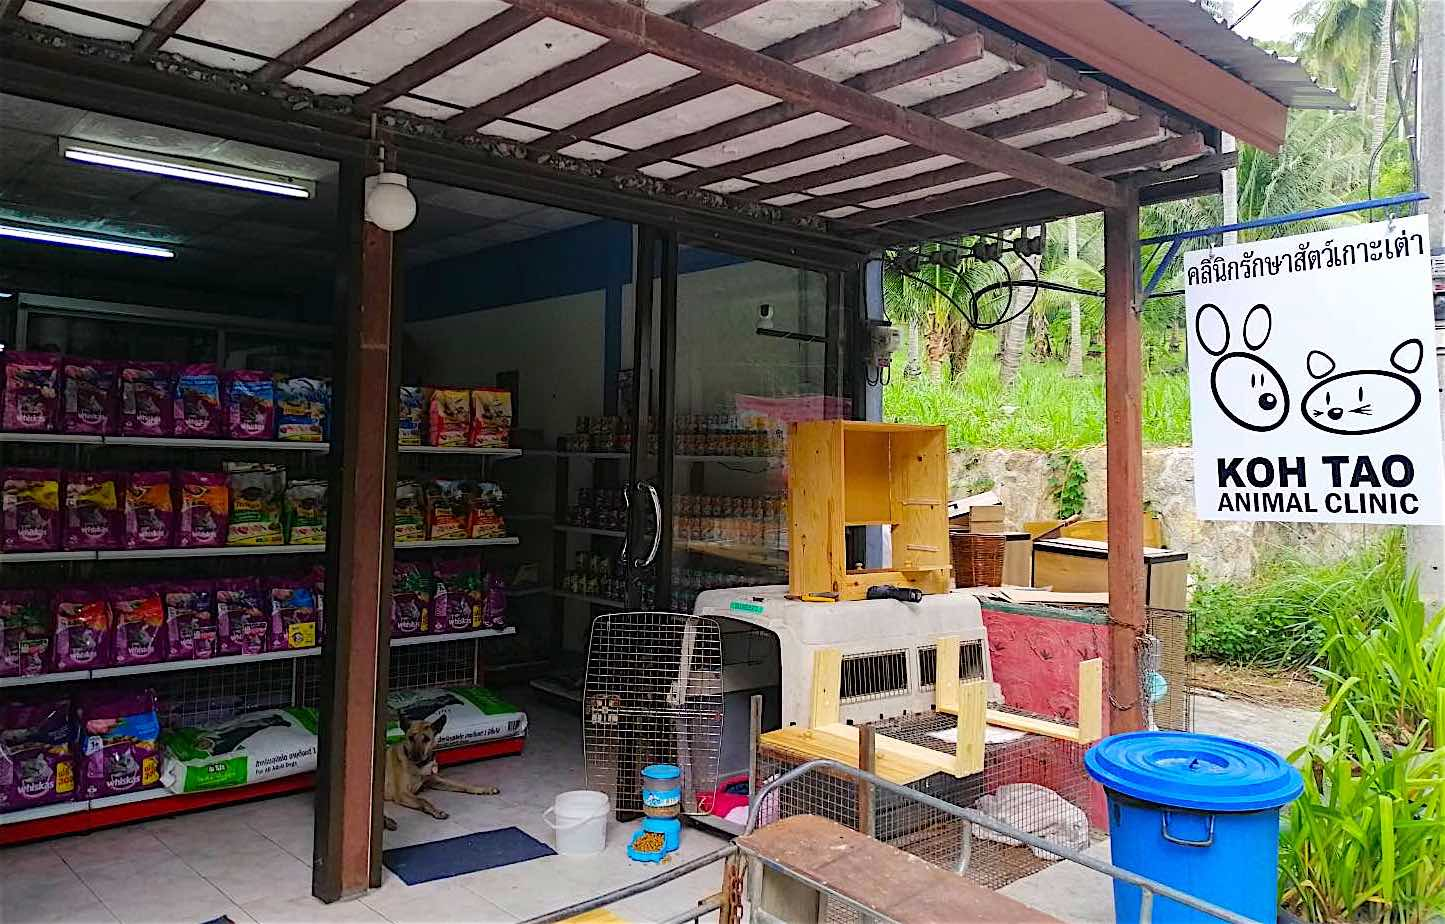 www.thefunkyturtle.com koh tao animal clinic thailand